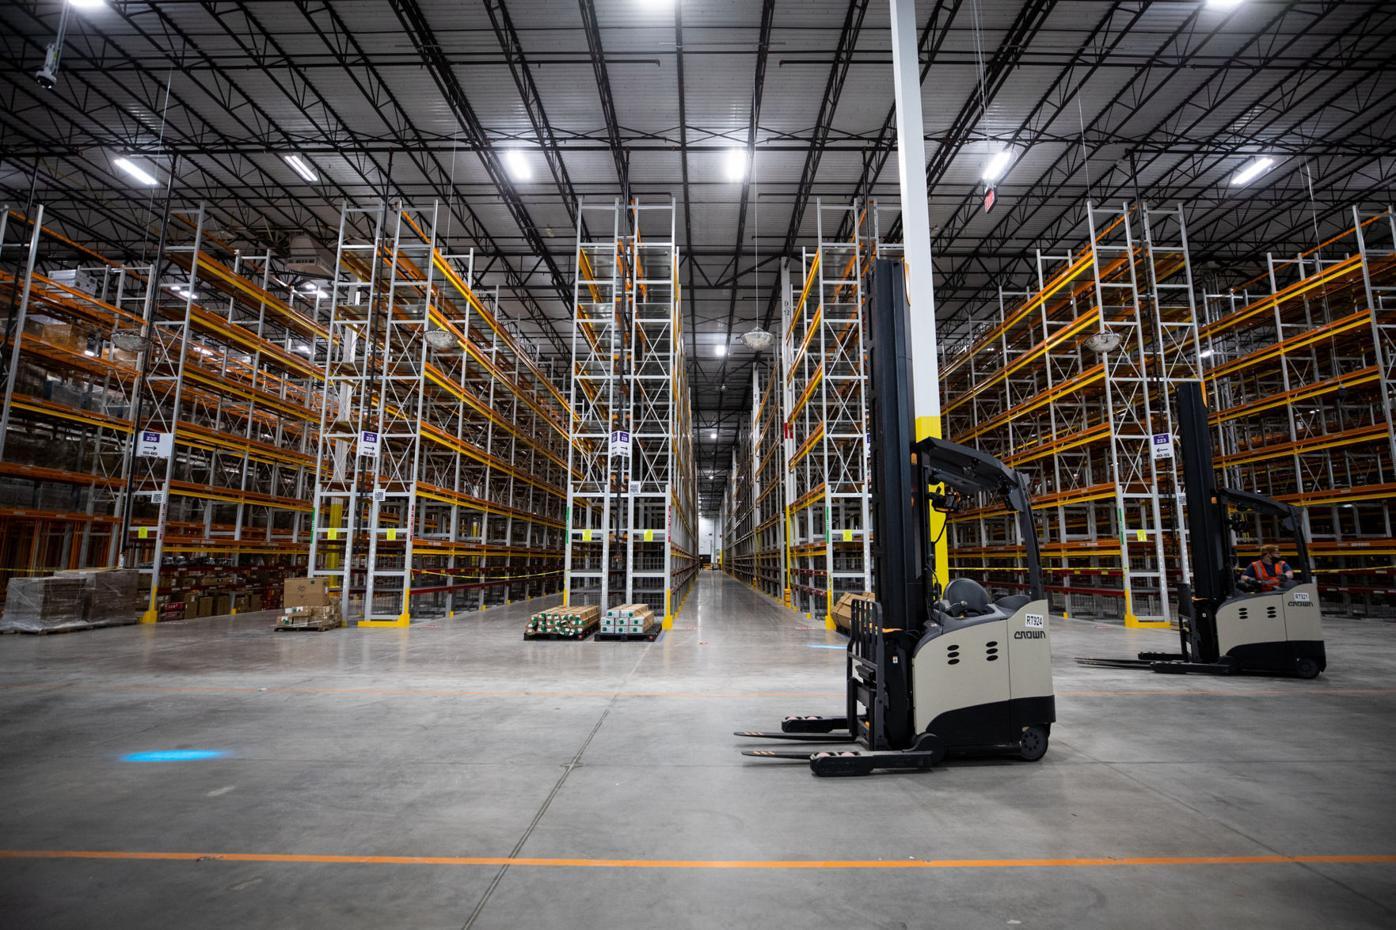 Amazon Fulfillment Center in Jessup